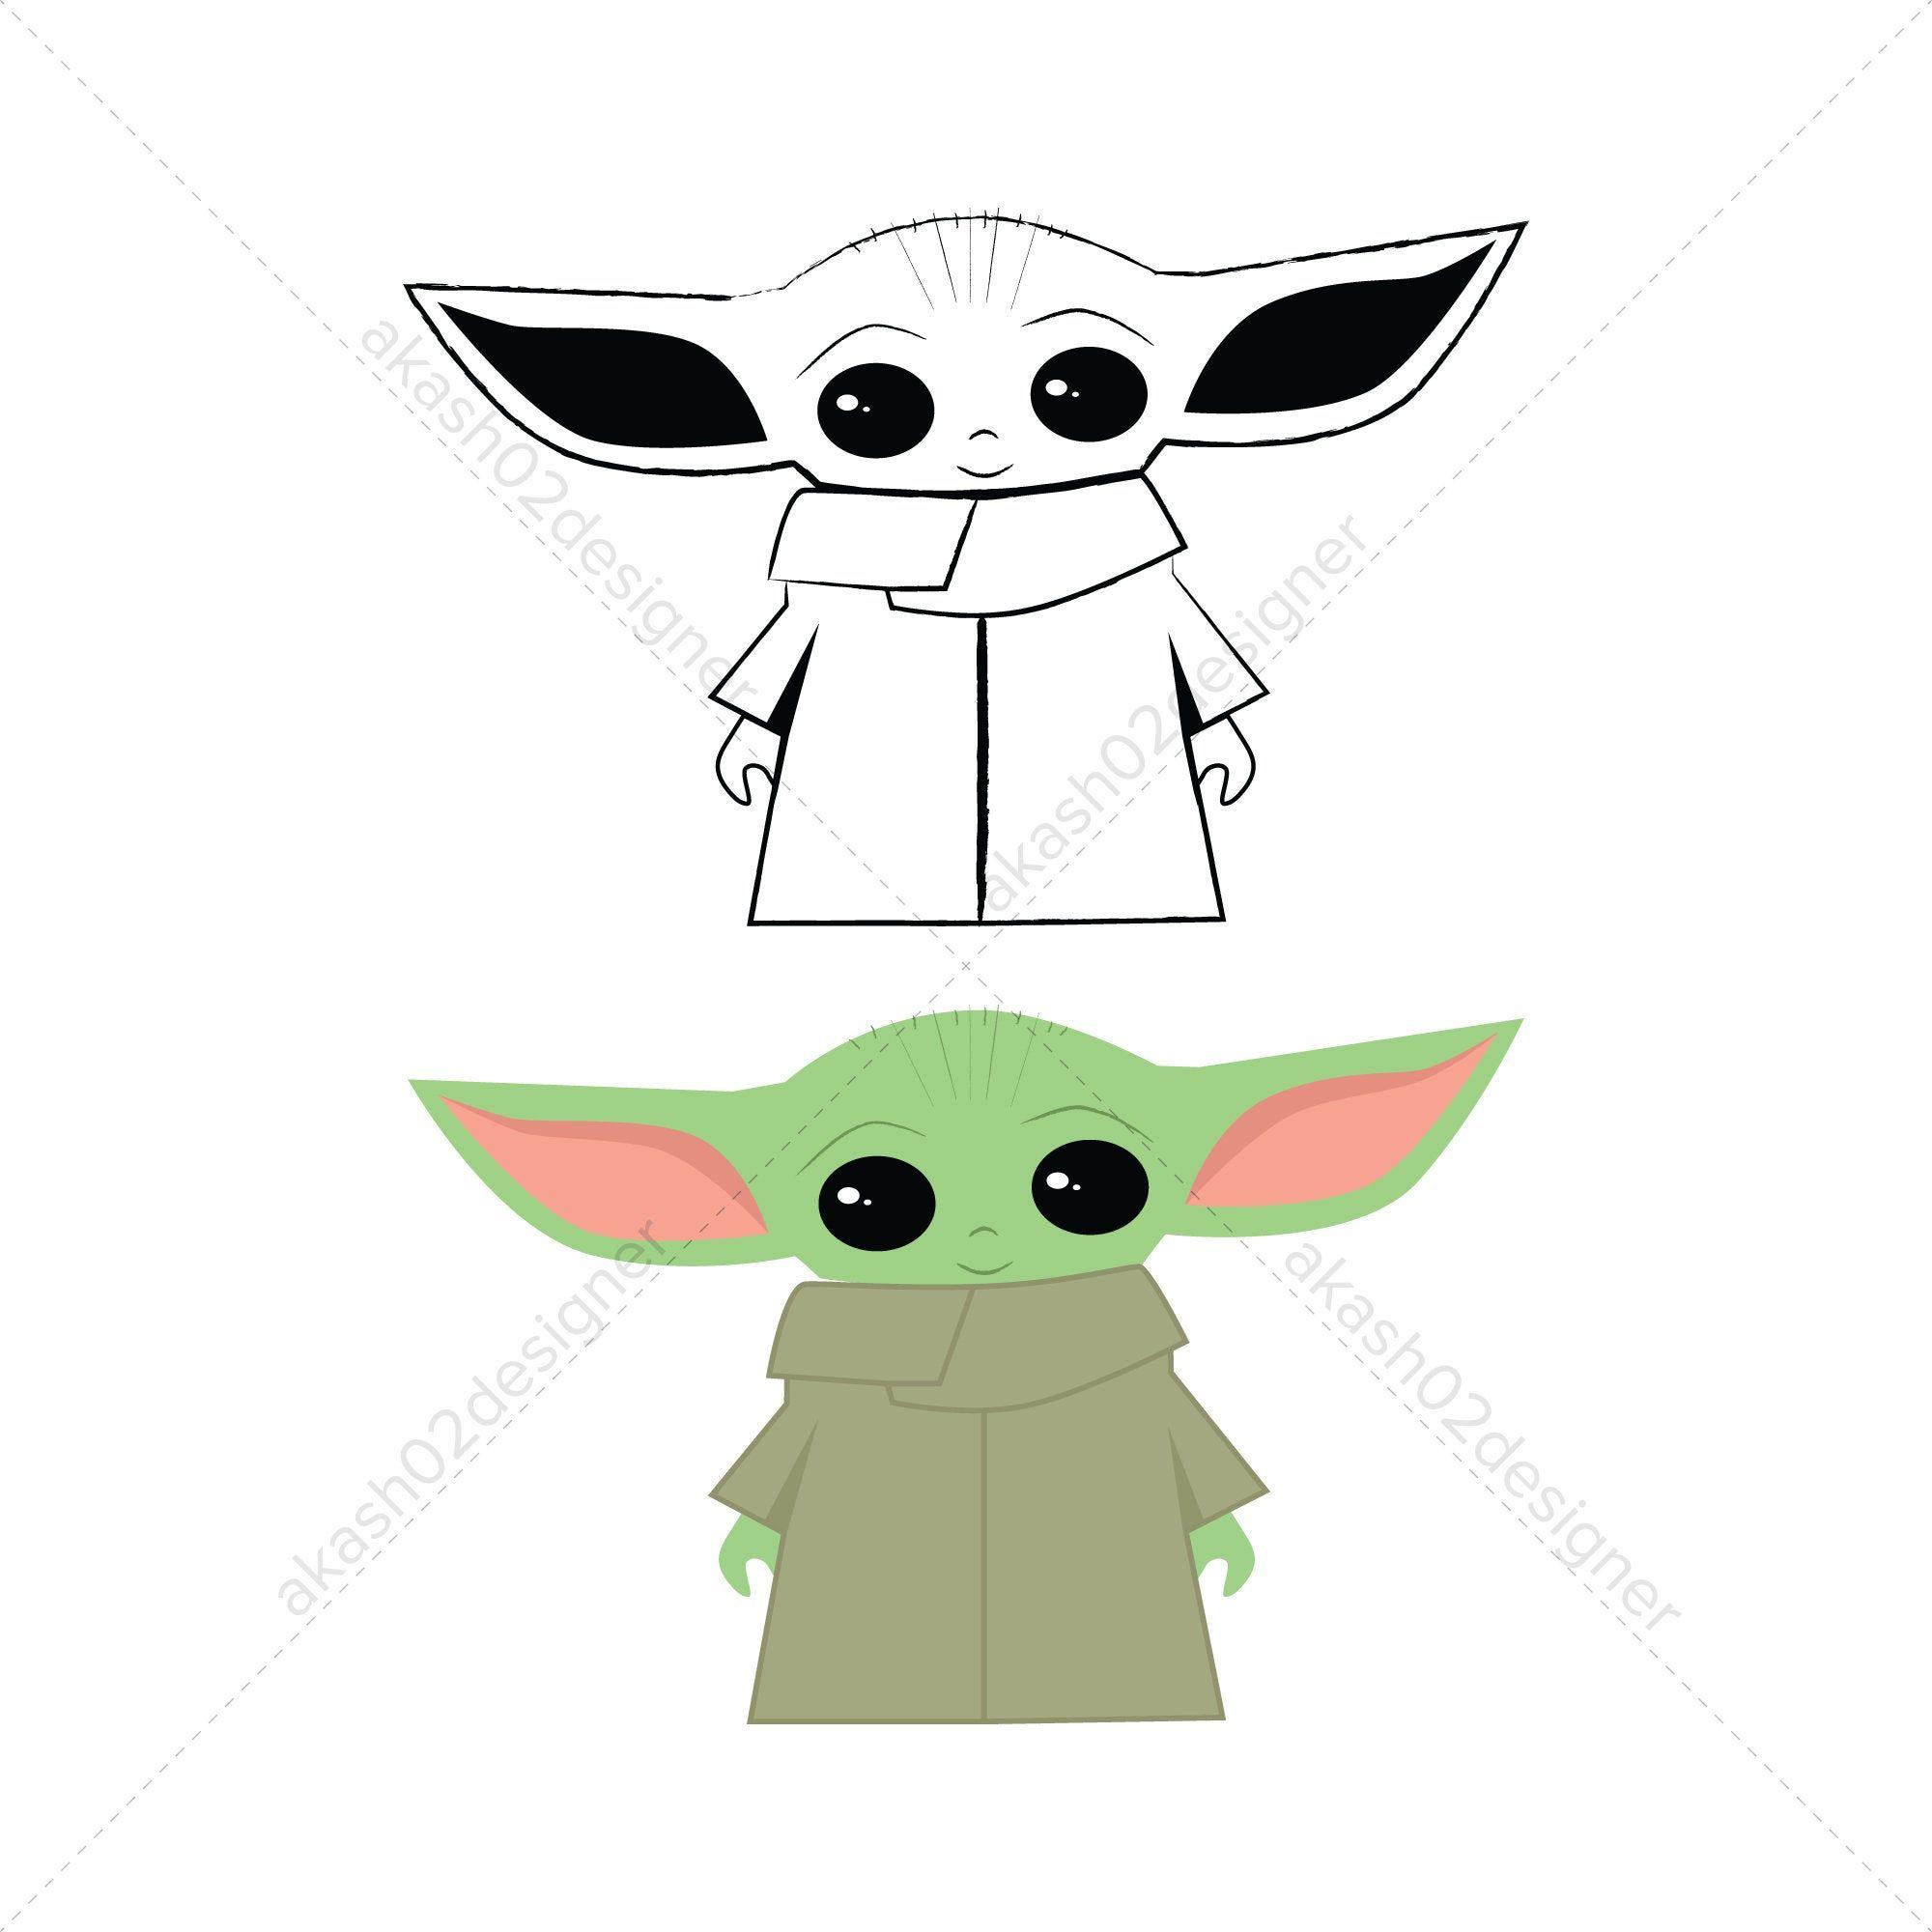 Super cute baby Yoda svg png jpeg AI EPS digital file